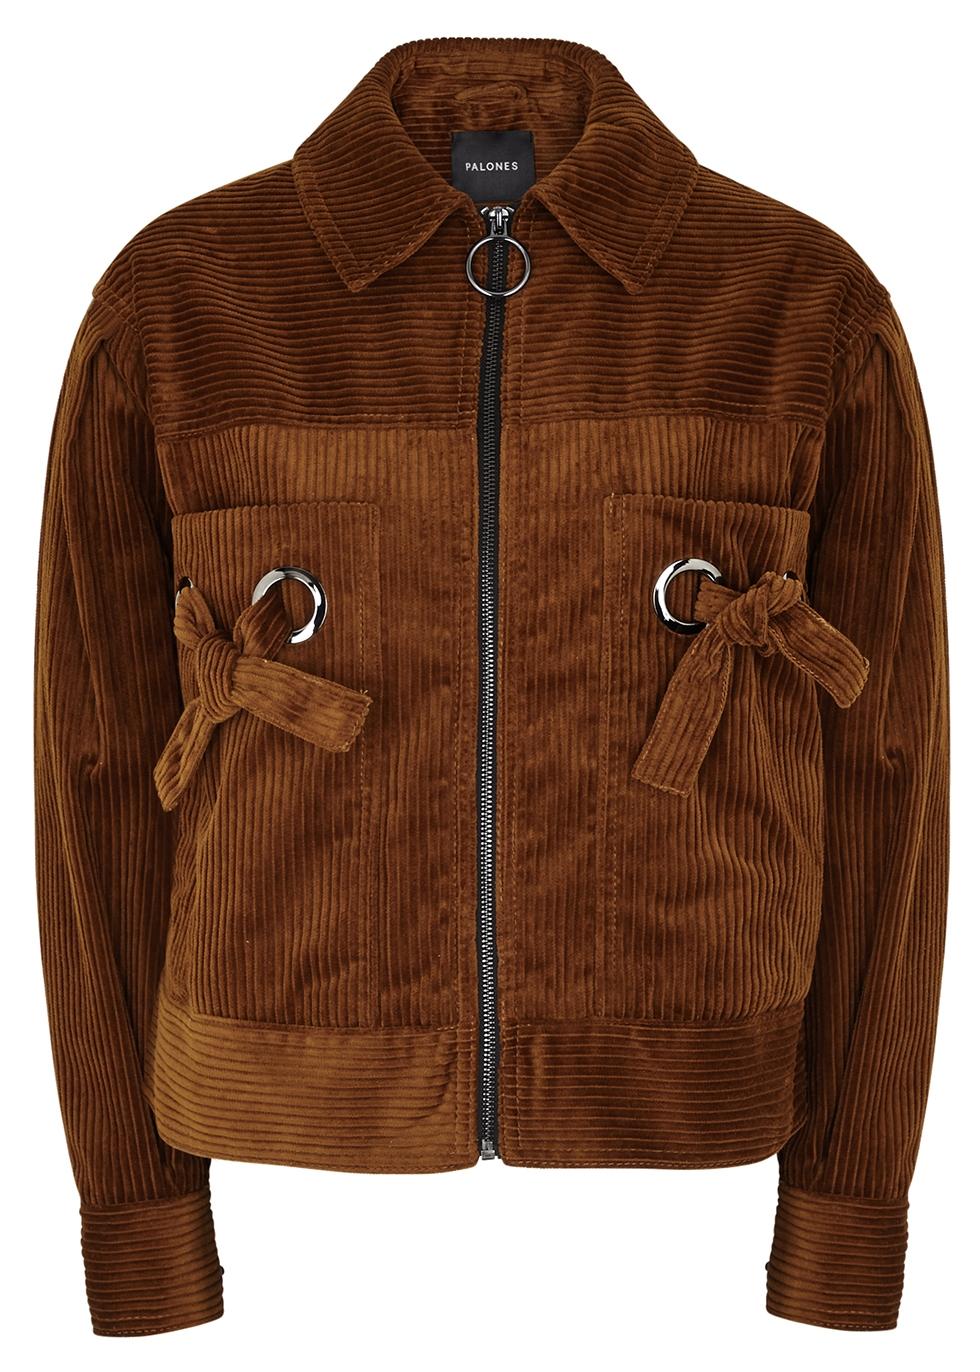 Jumbo chesnut corduroy jacket